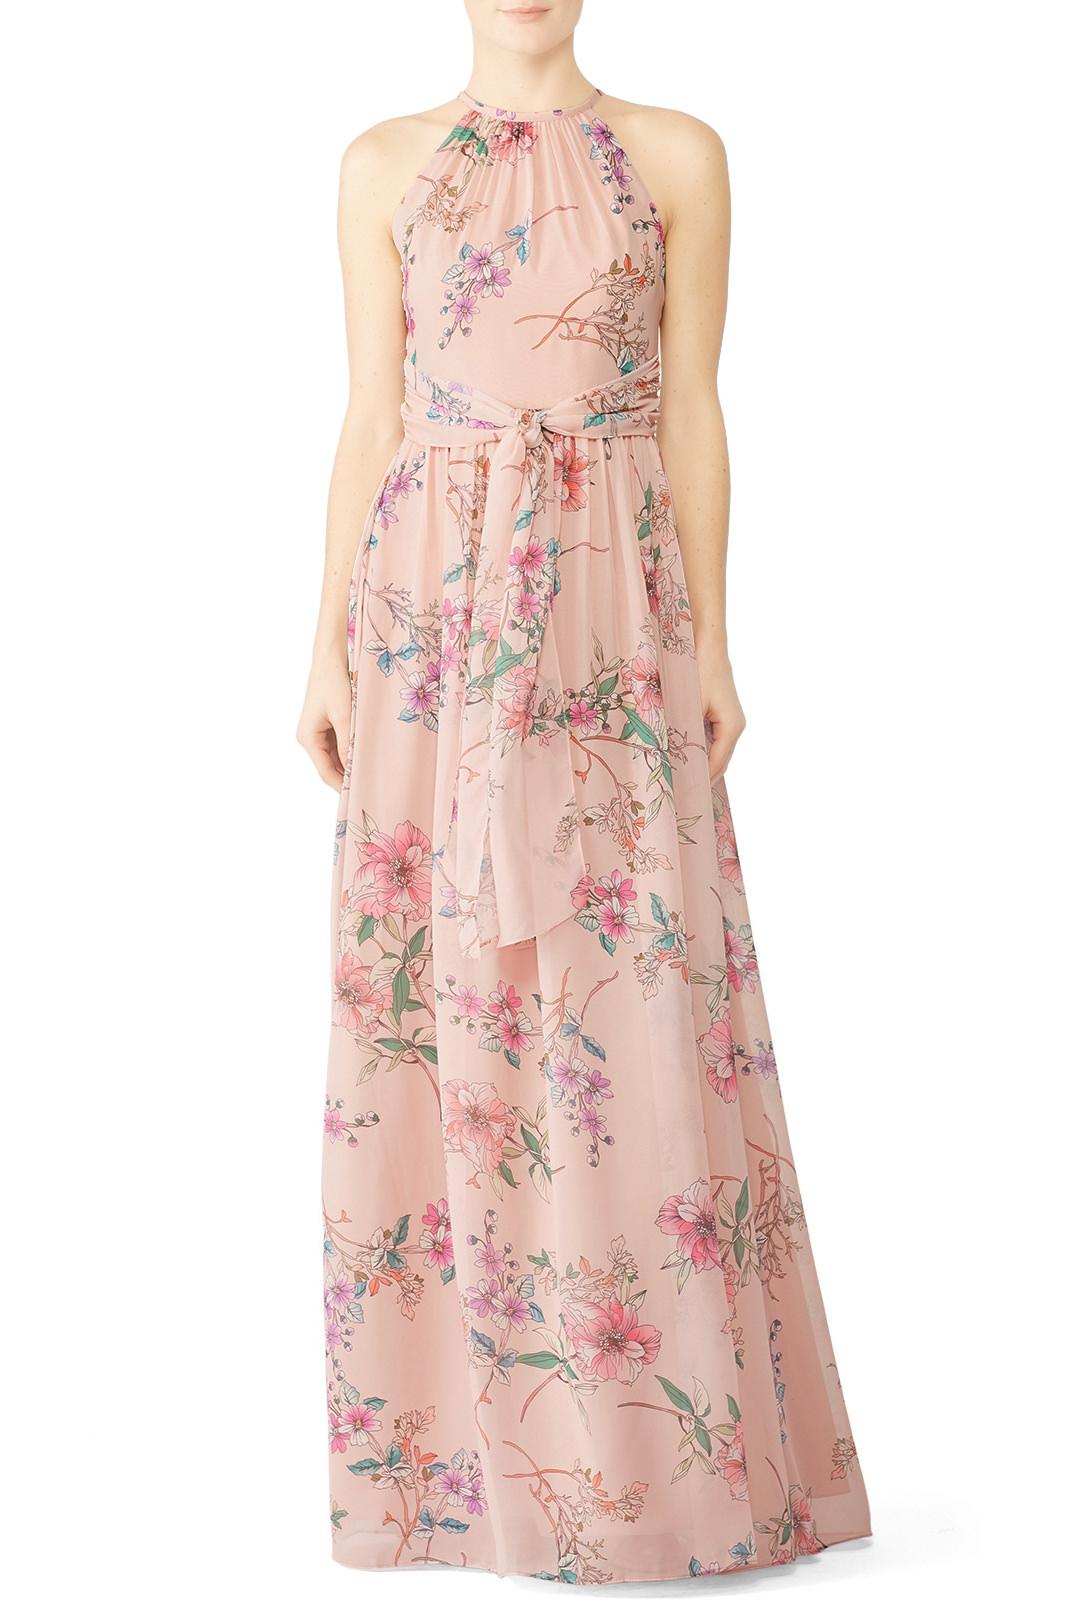 9f1794f4b21 Affordable Bridesmaid Dresses - Cheap Wedding Style